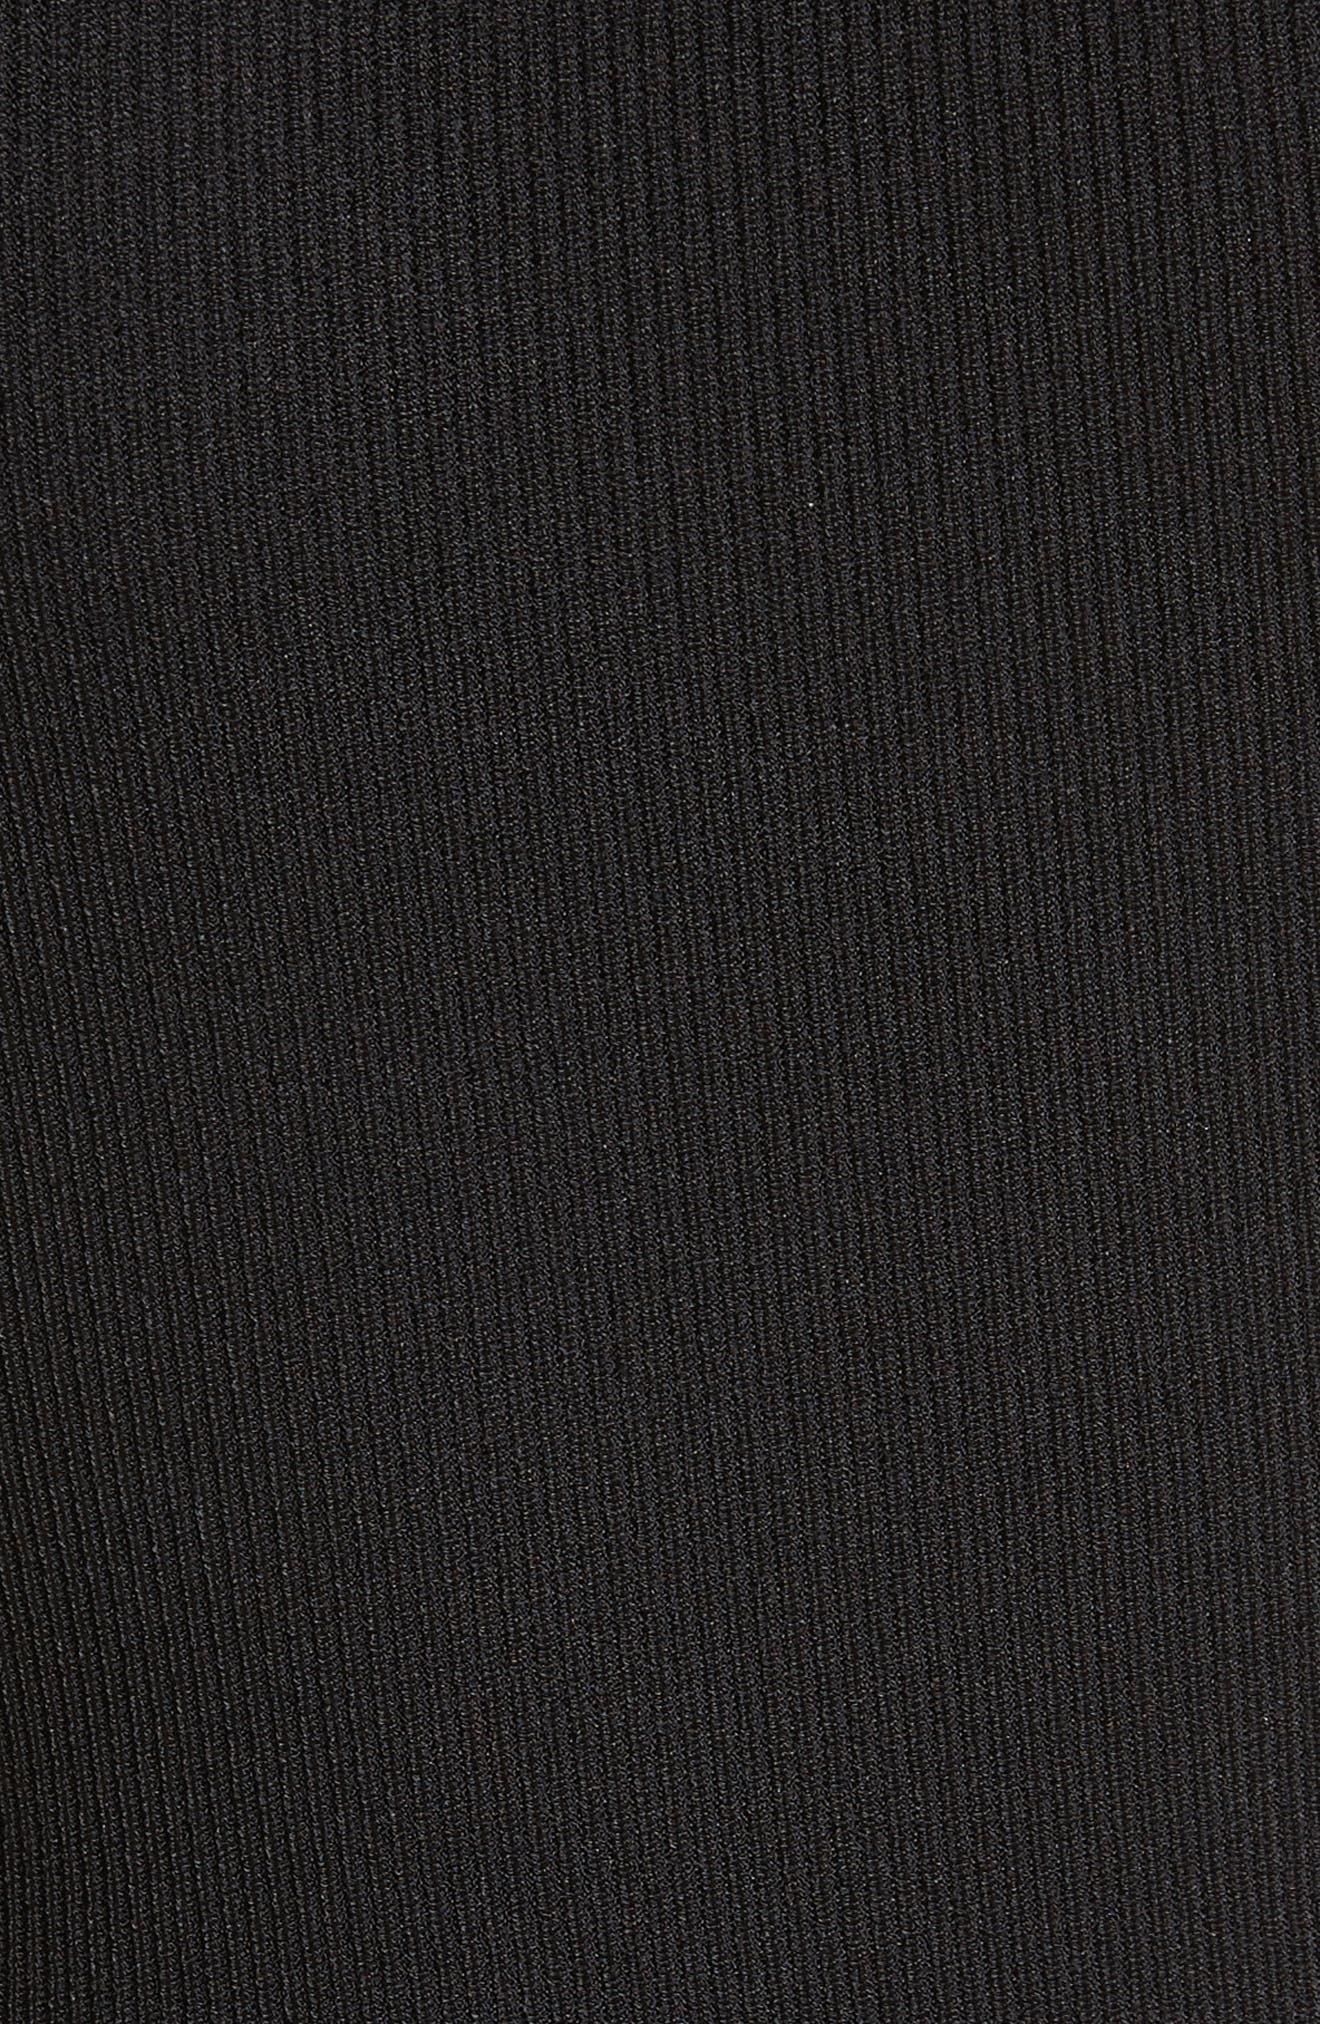 Vika One-Shoulder Knit Flare Dress,                             Alternate thumbnail 5, color,                             001